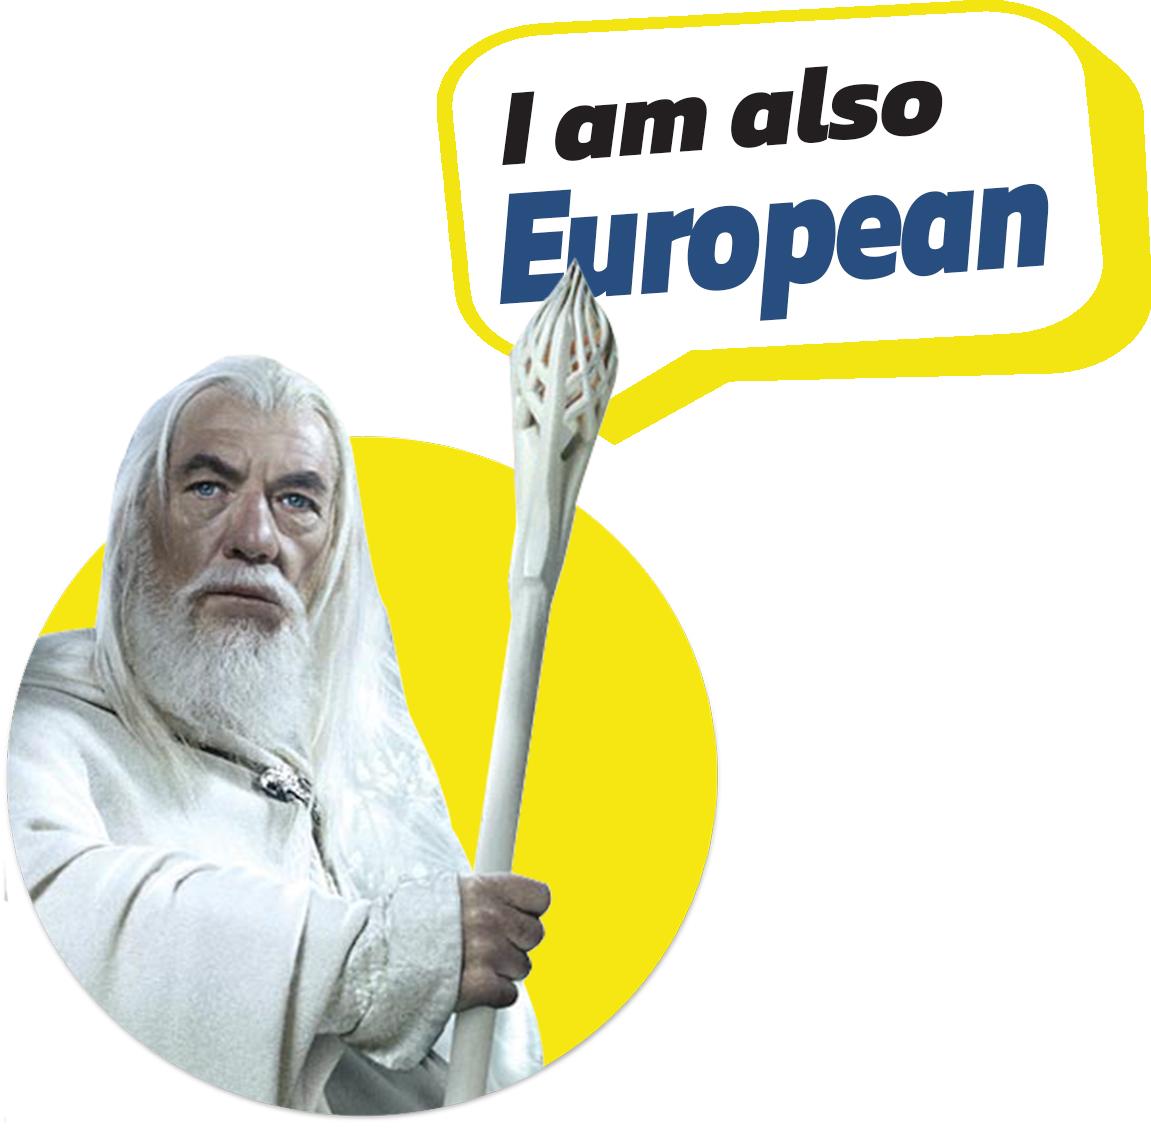 European Characters -Gandalf